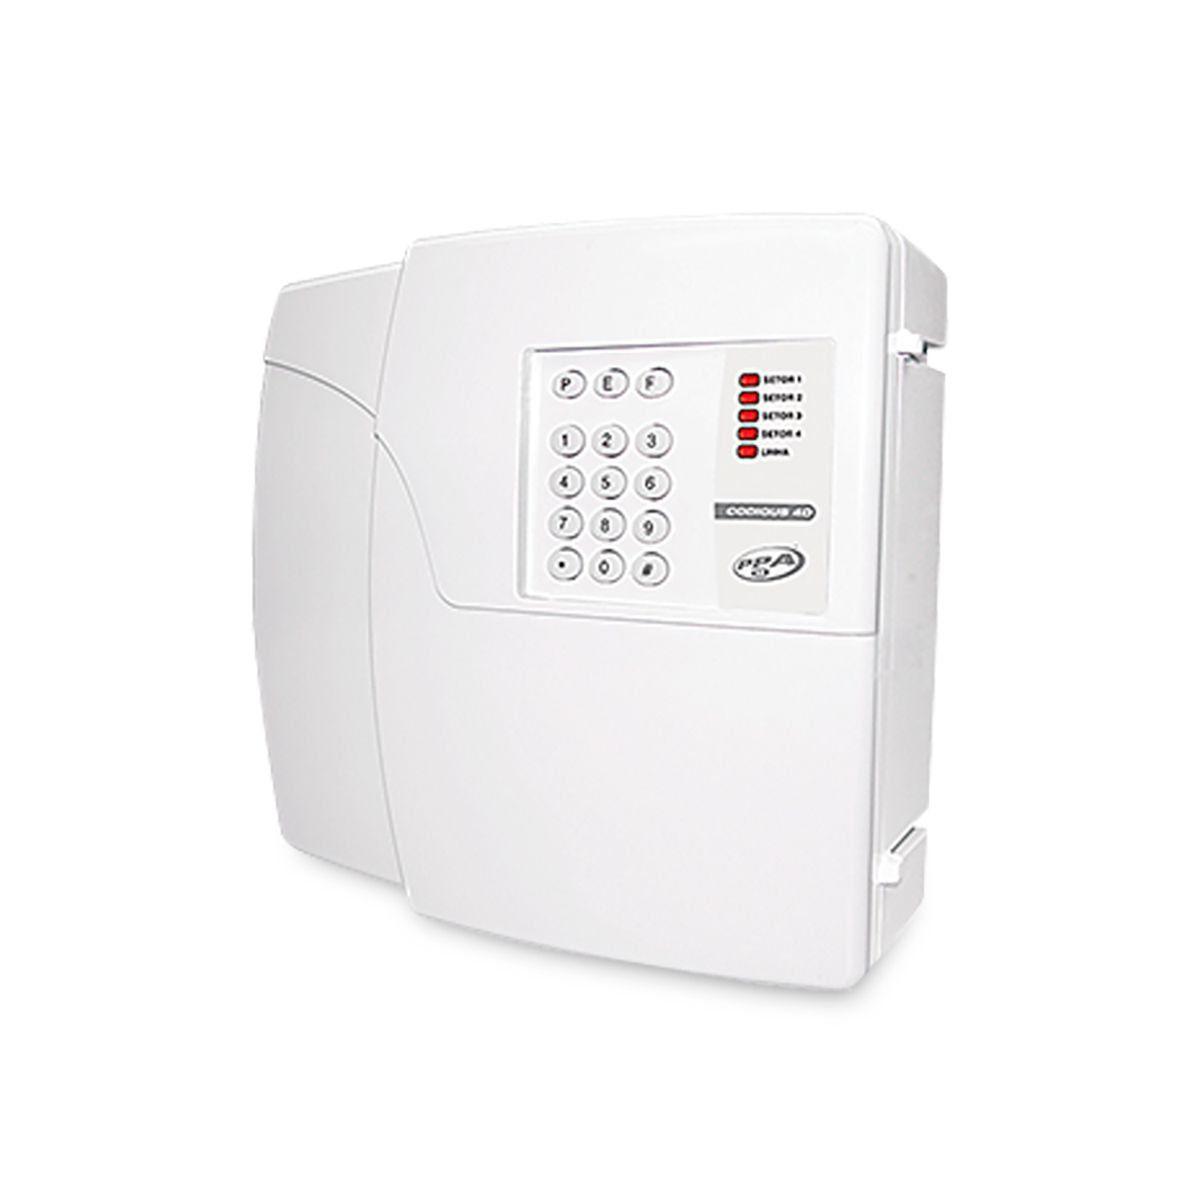 Kit Alarme Residencial PPA 6 Sensores Sem Fio Discadora